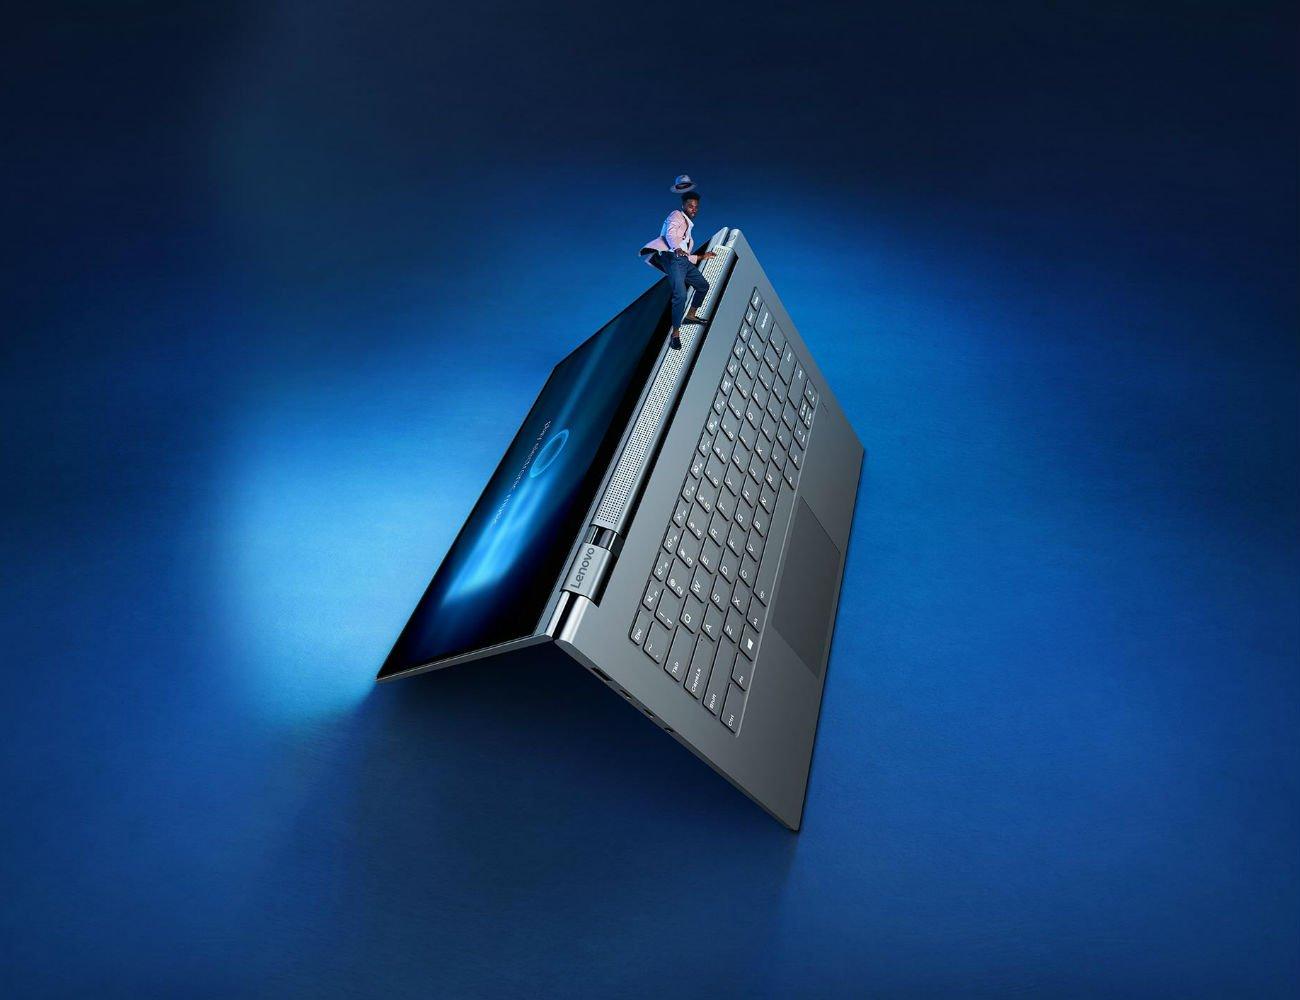 Lenovo Yoga C930 Laptop